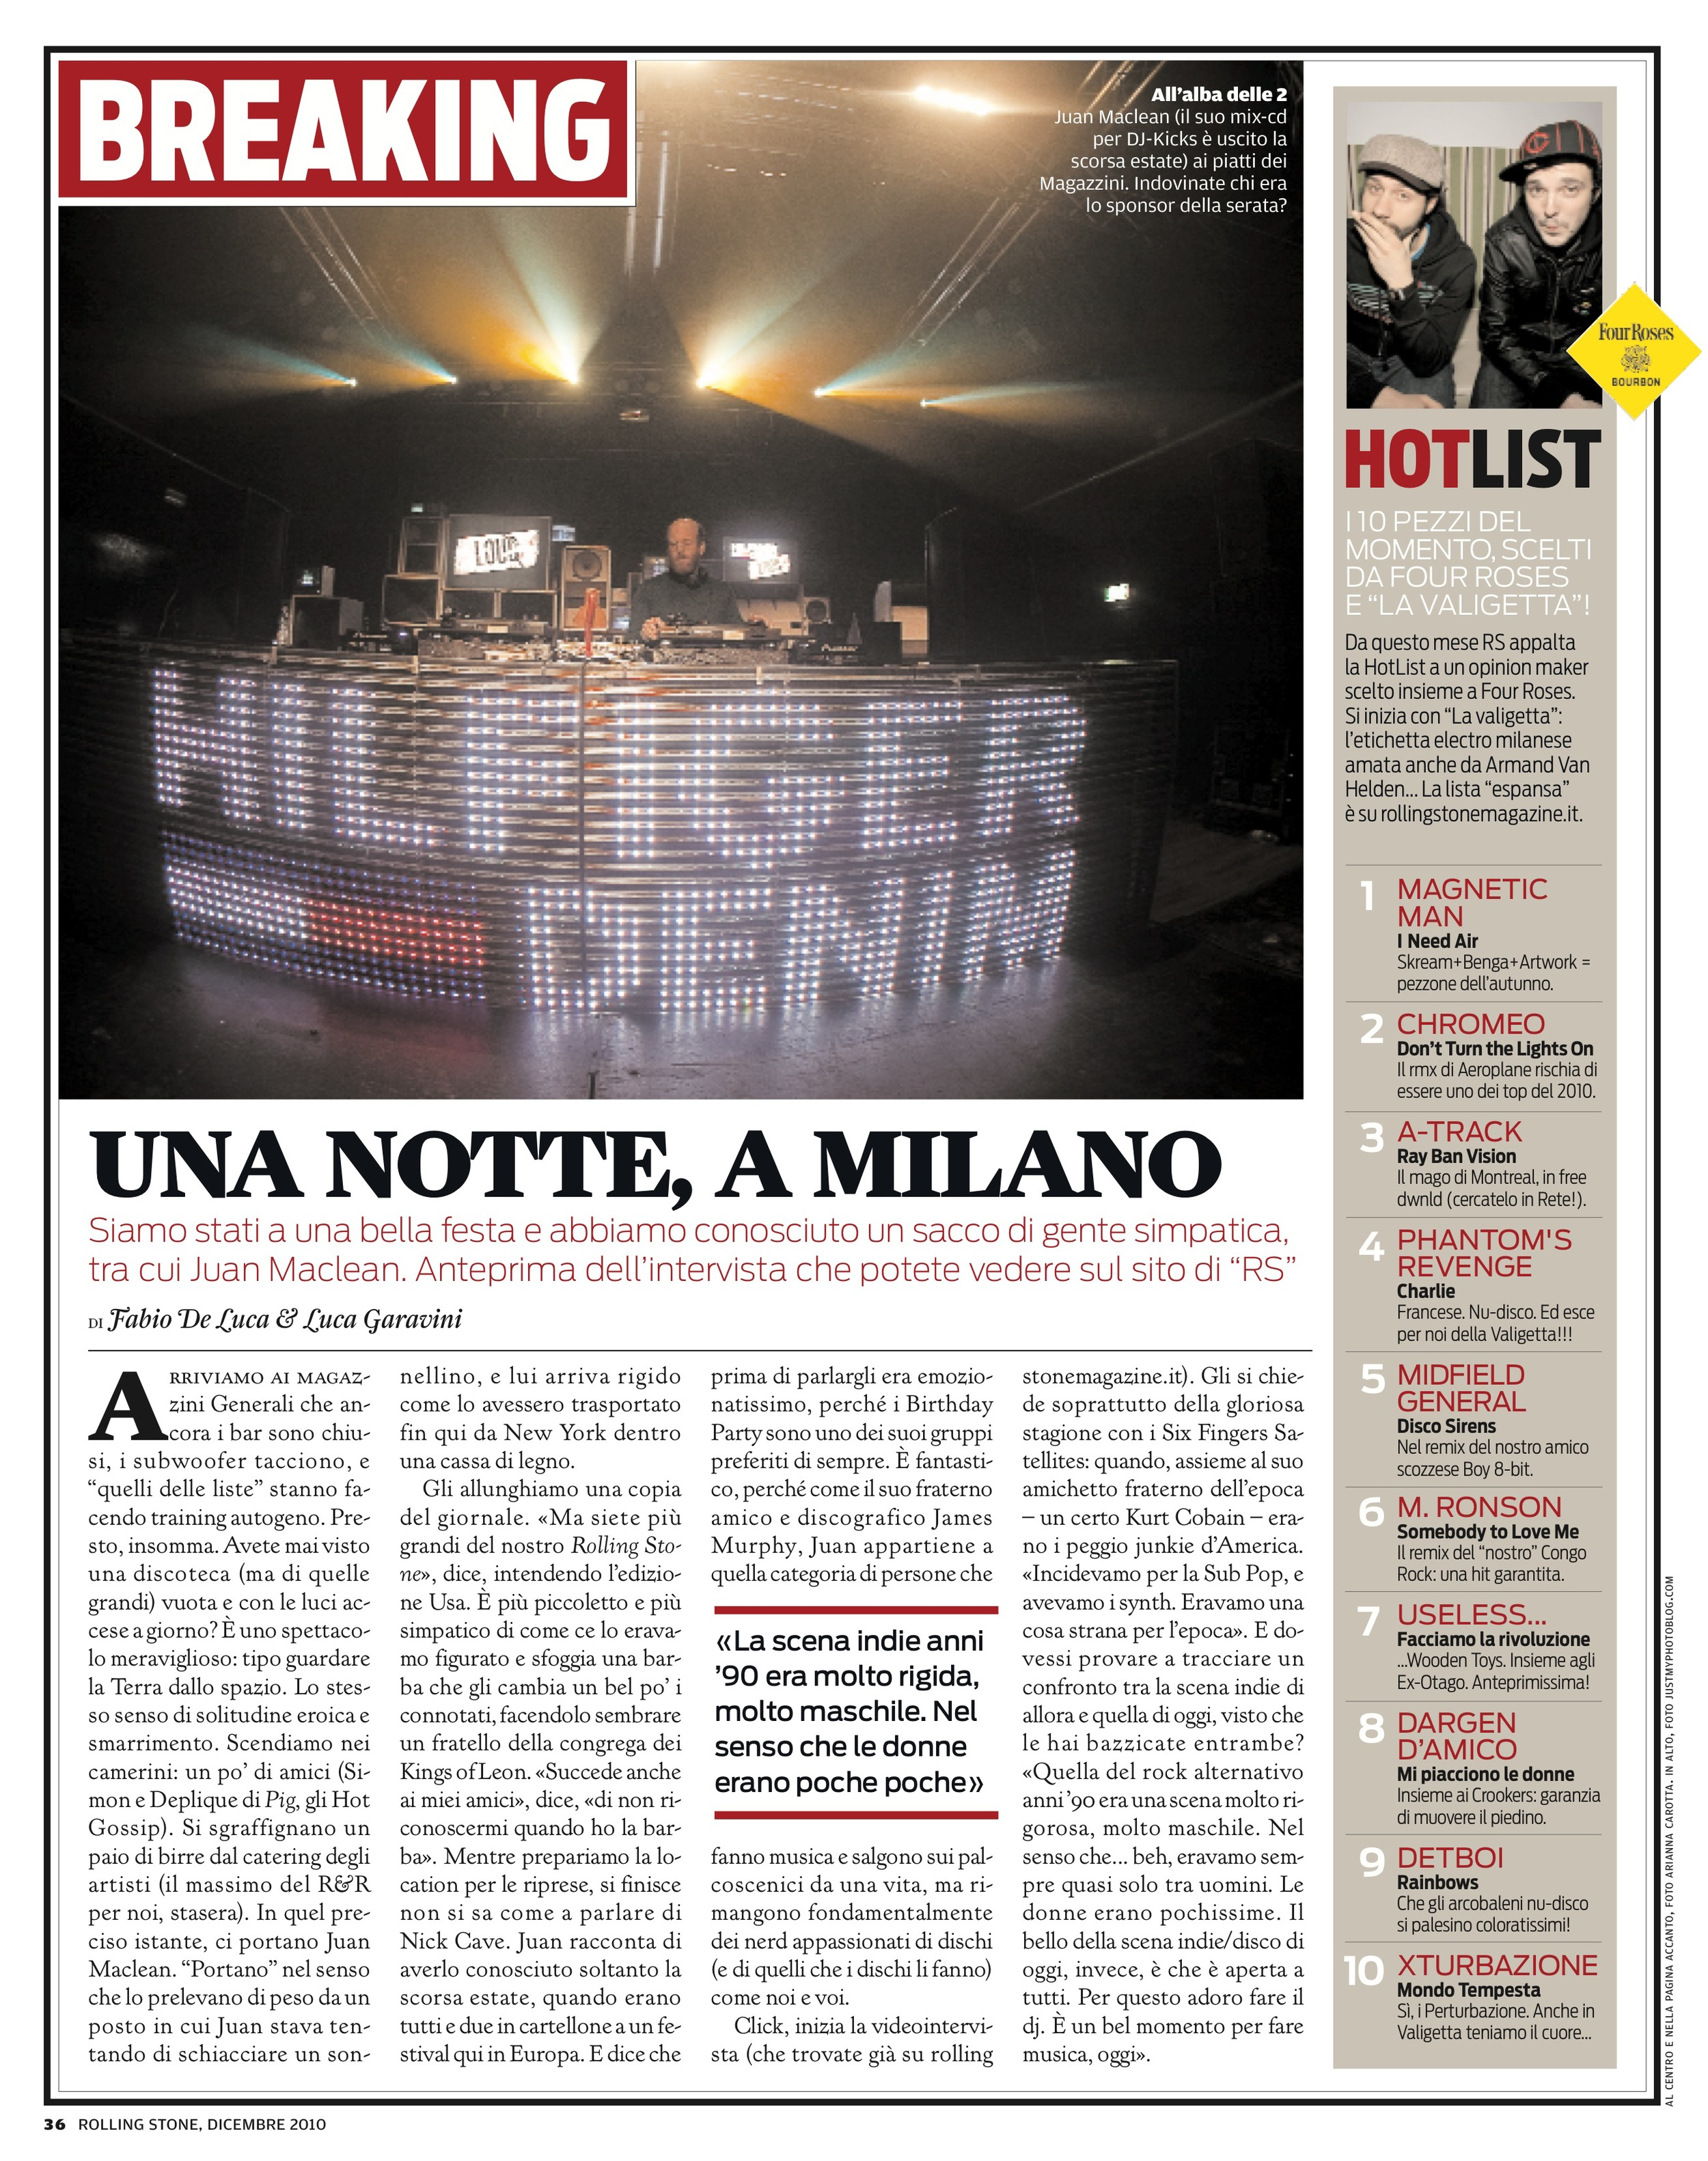 La Valigetta / Rolling Stone